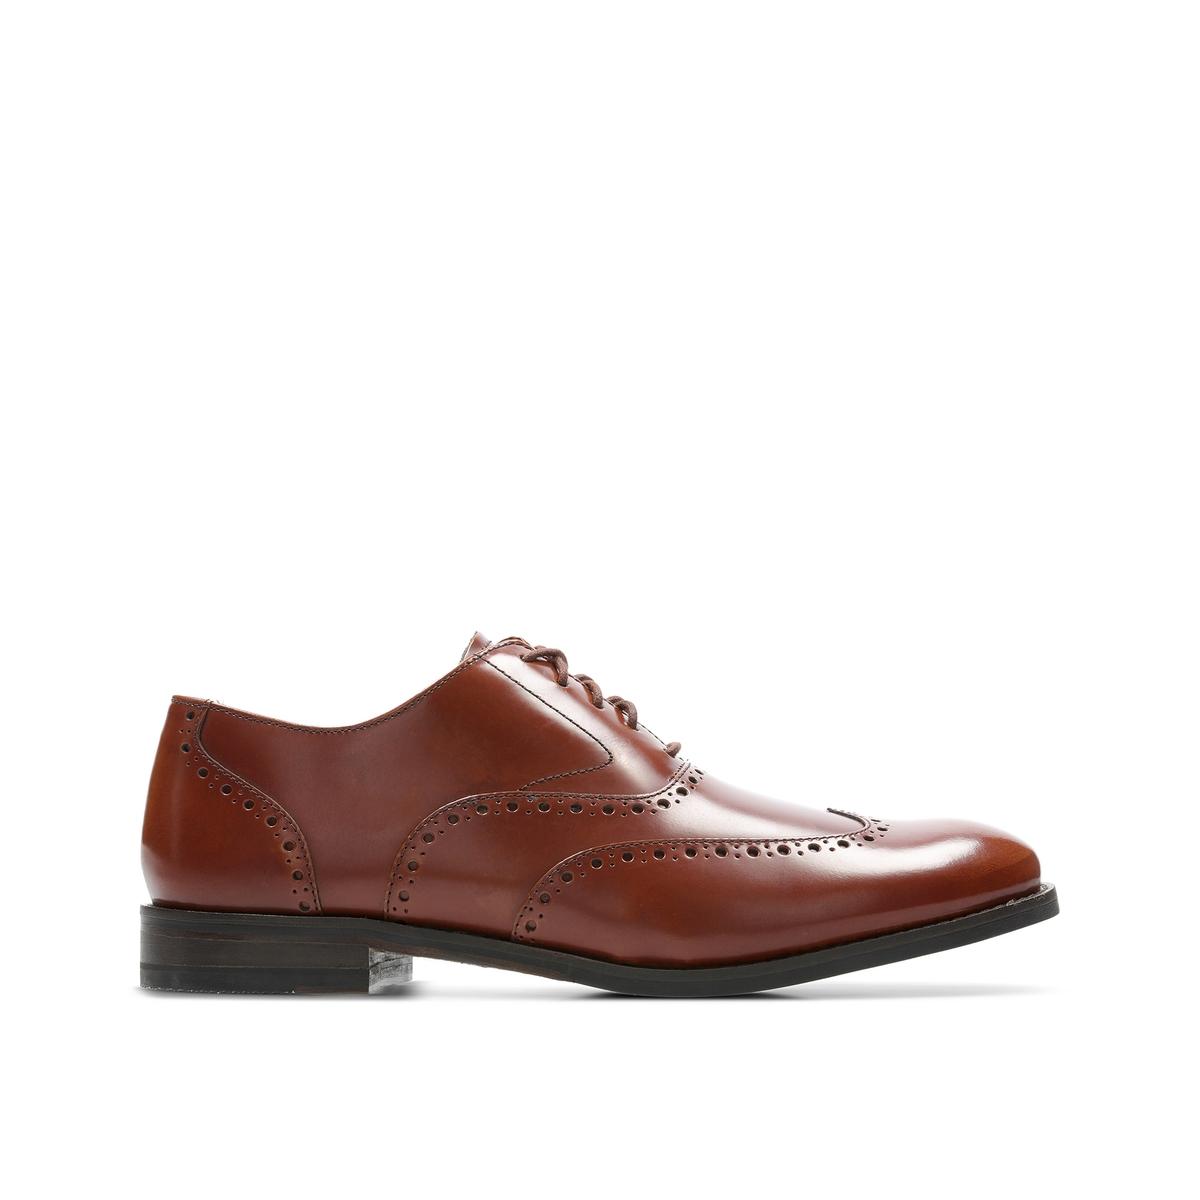 Ботинки-дерби La Redoute Из кожи Edward Walk 40 каштановый цена 2017